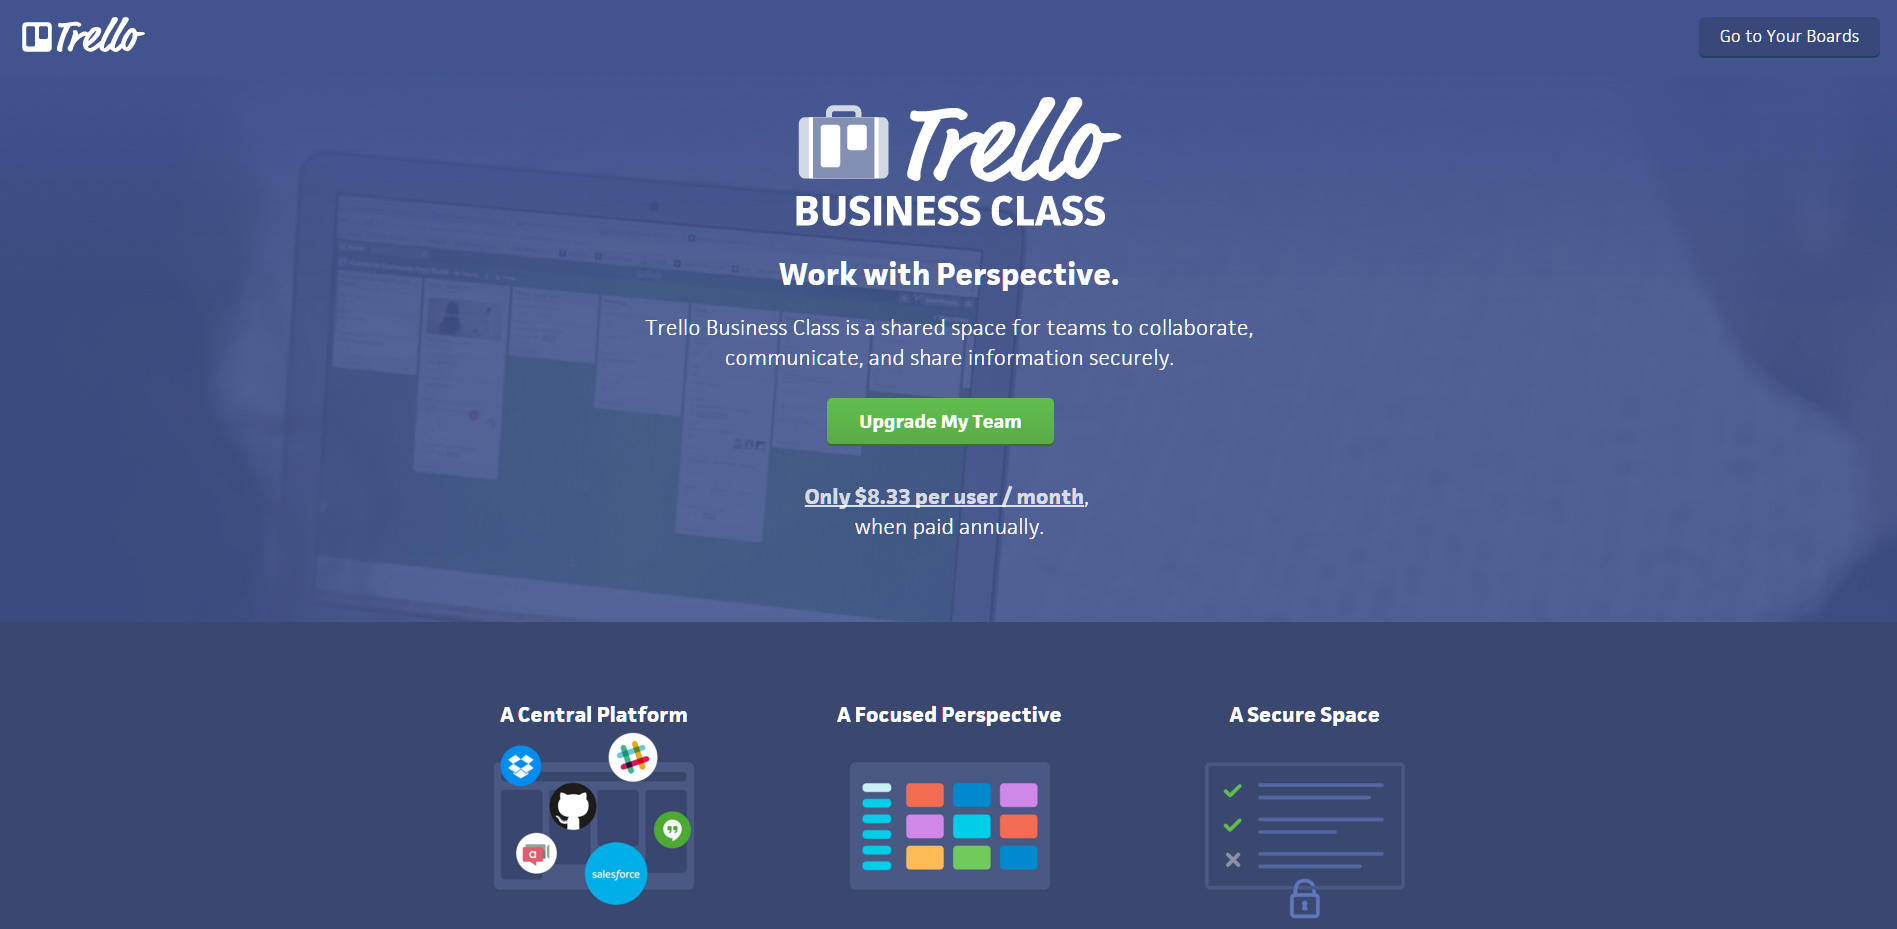 Trello Business Class